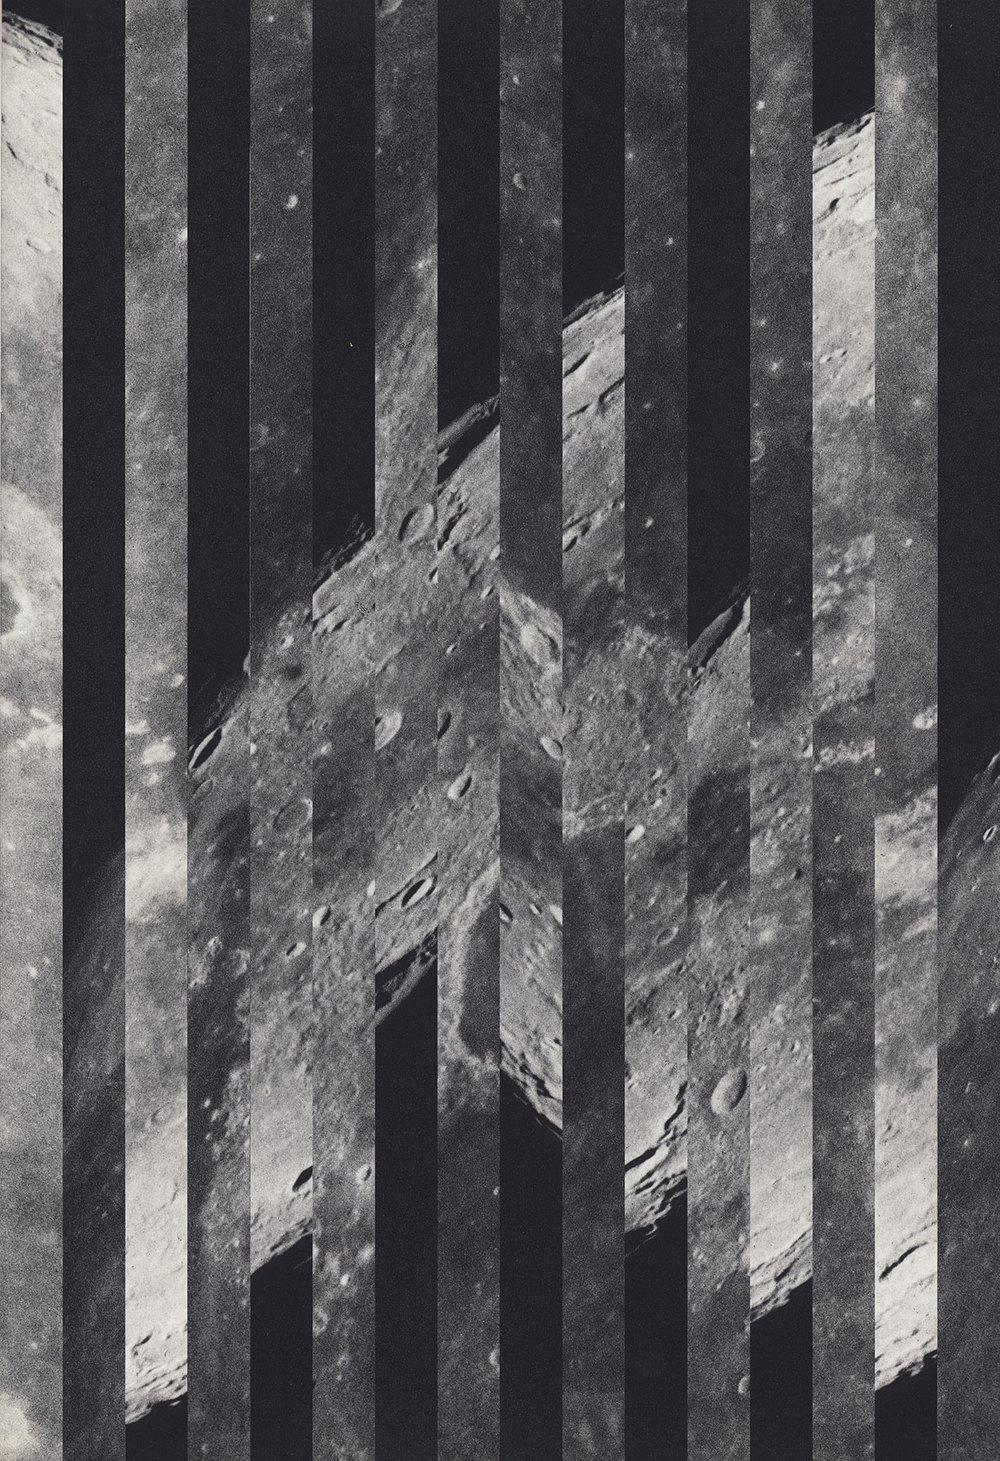 f7_luis_dourado_moons_paralysis4_yatzer.jpg